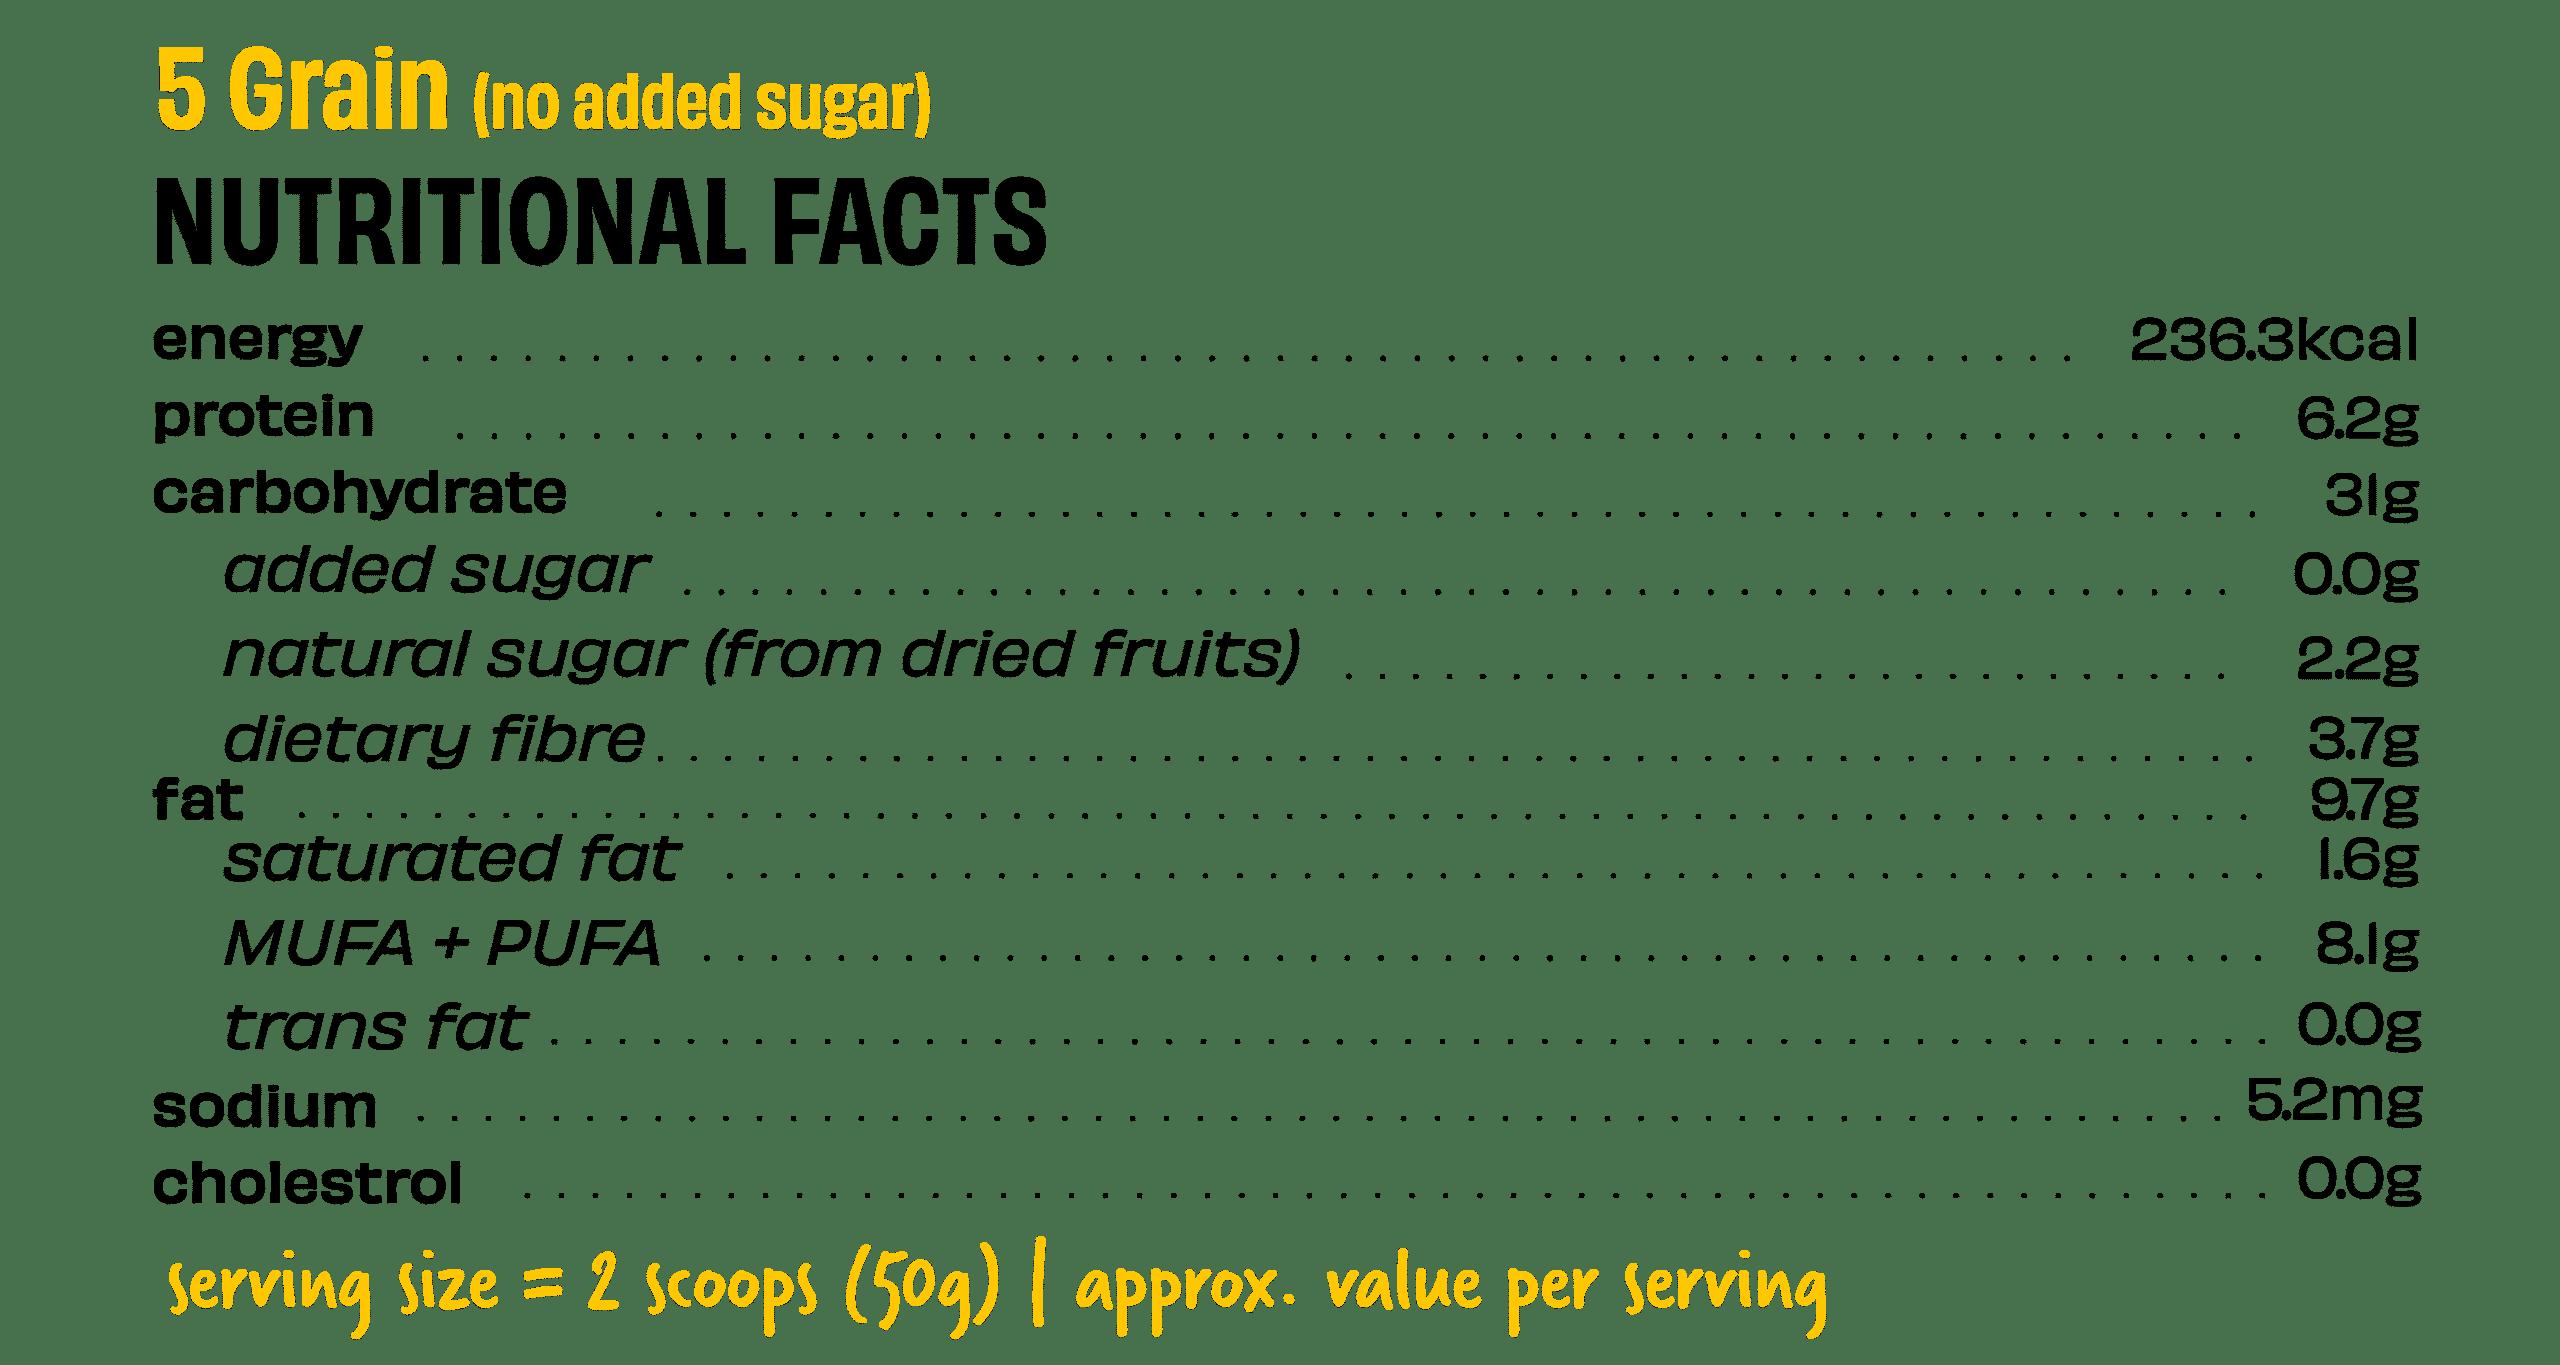 nutri_5grain nutritional facts copy